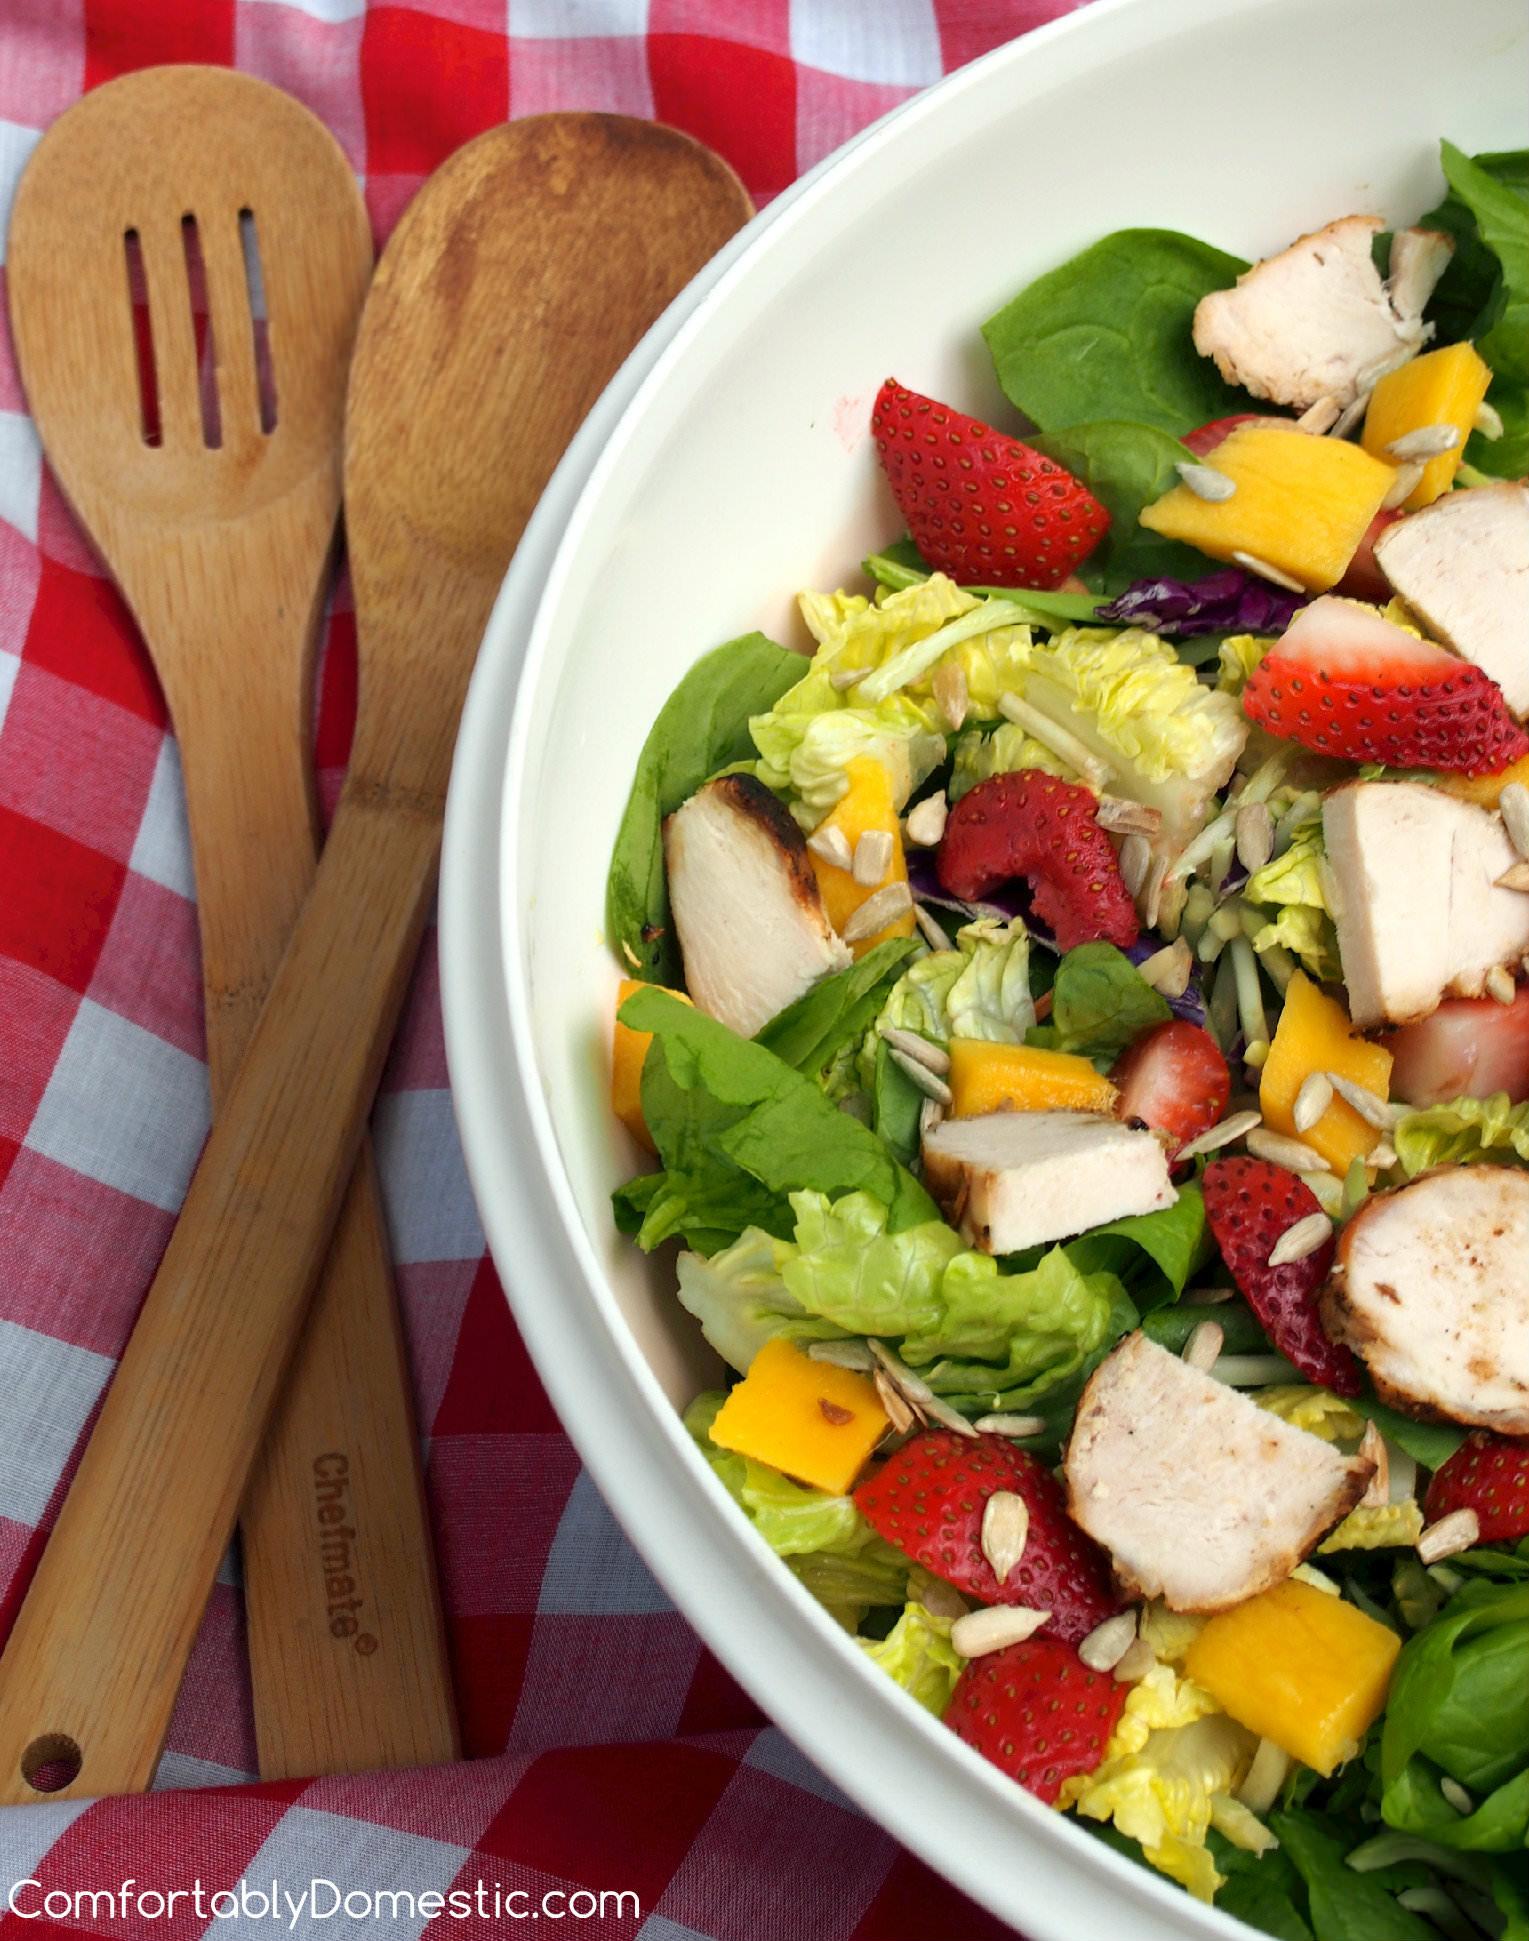 Summer Strawberry Mango Salad with Strawberry Poppyseed Vinaigrette | ComfortablyDomestic.com